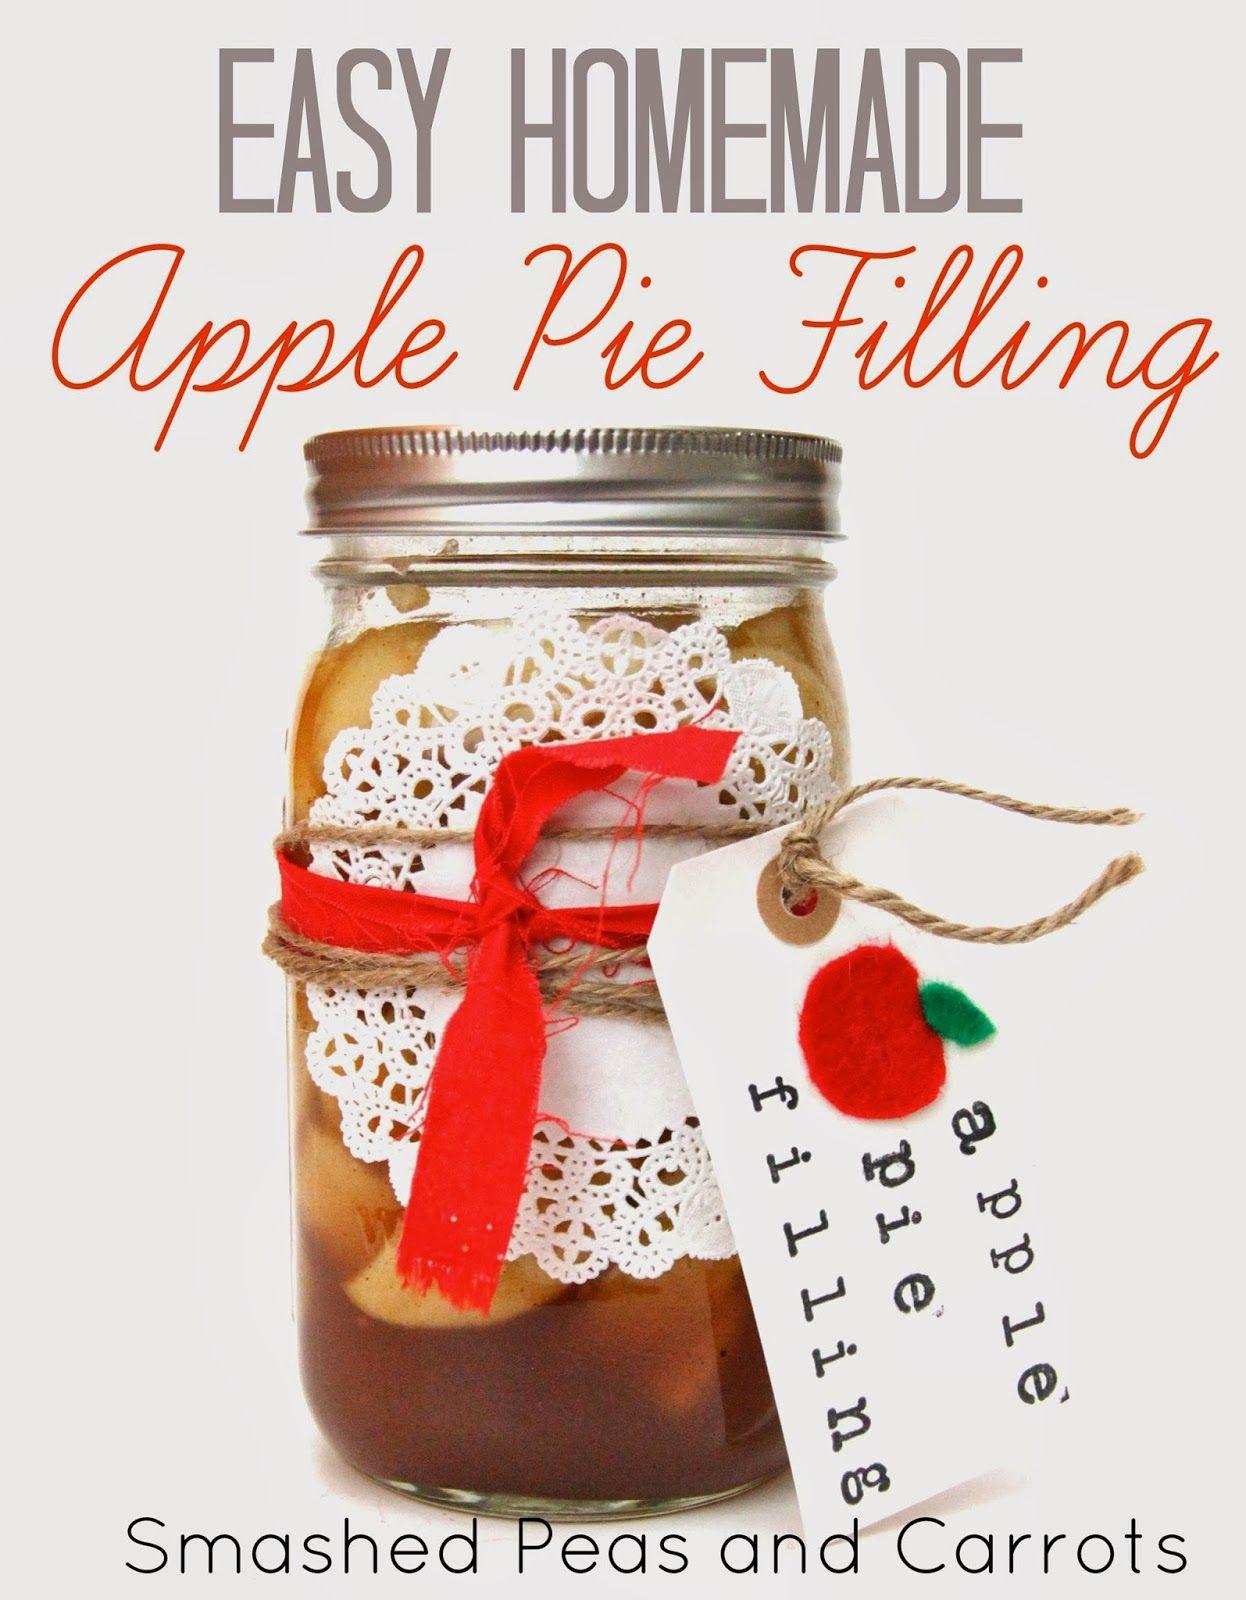 RECIPE: Easy Homemade Apple Pie Filling @smashedpeas